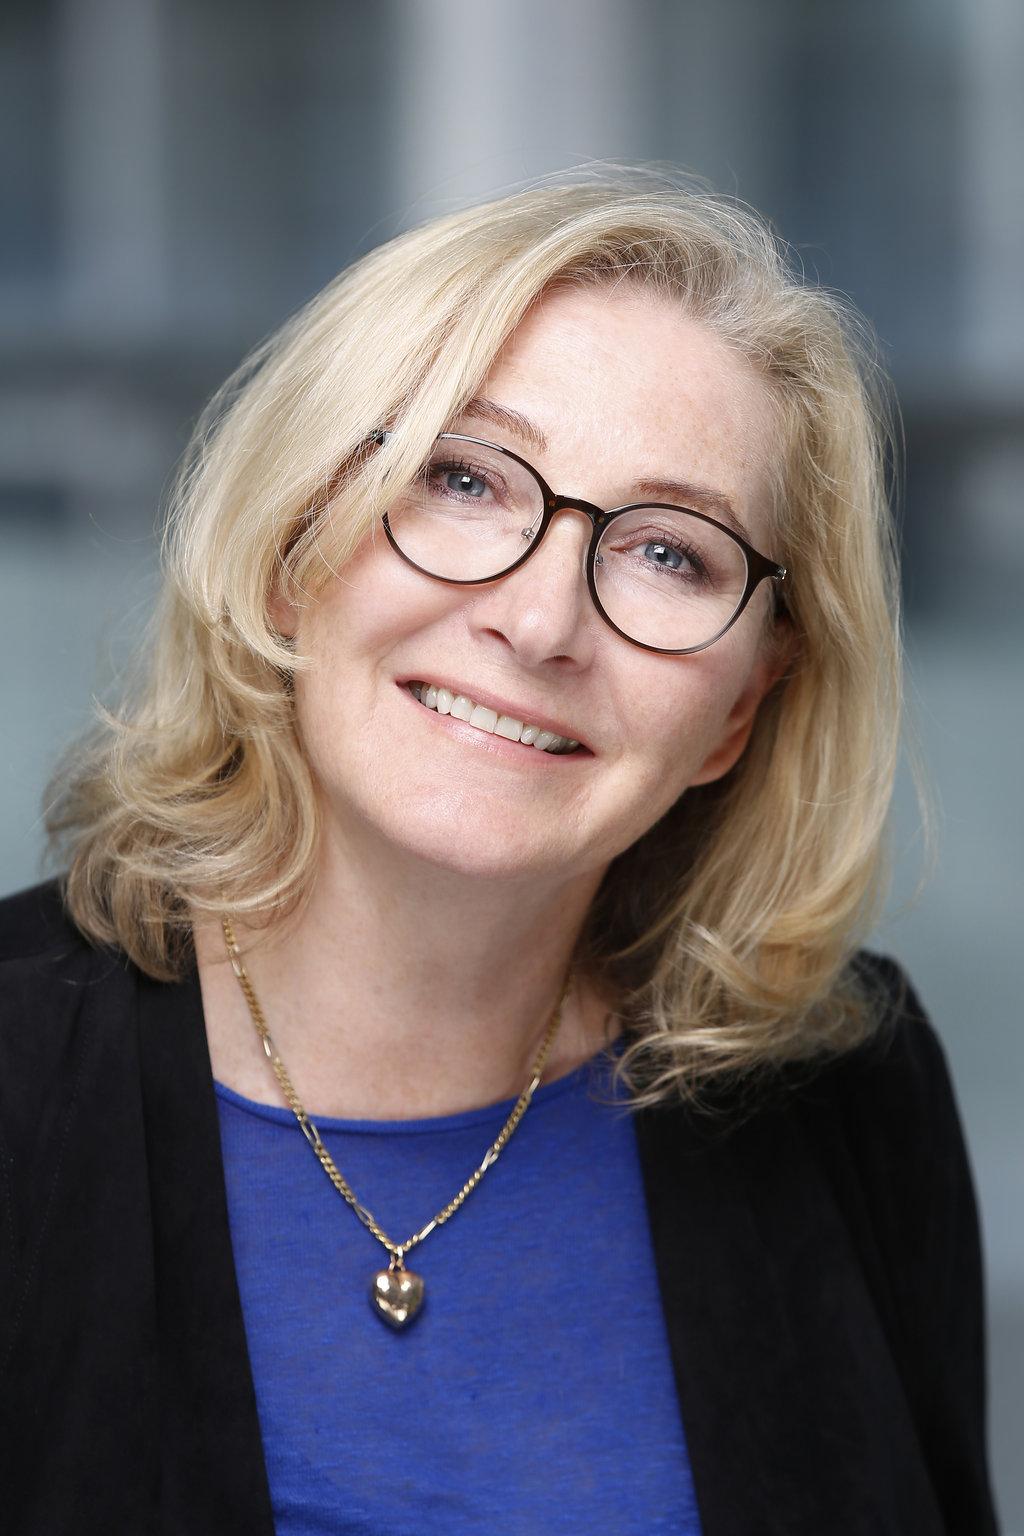 Melanie Wold